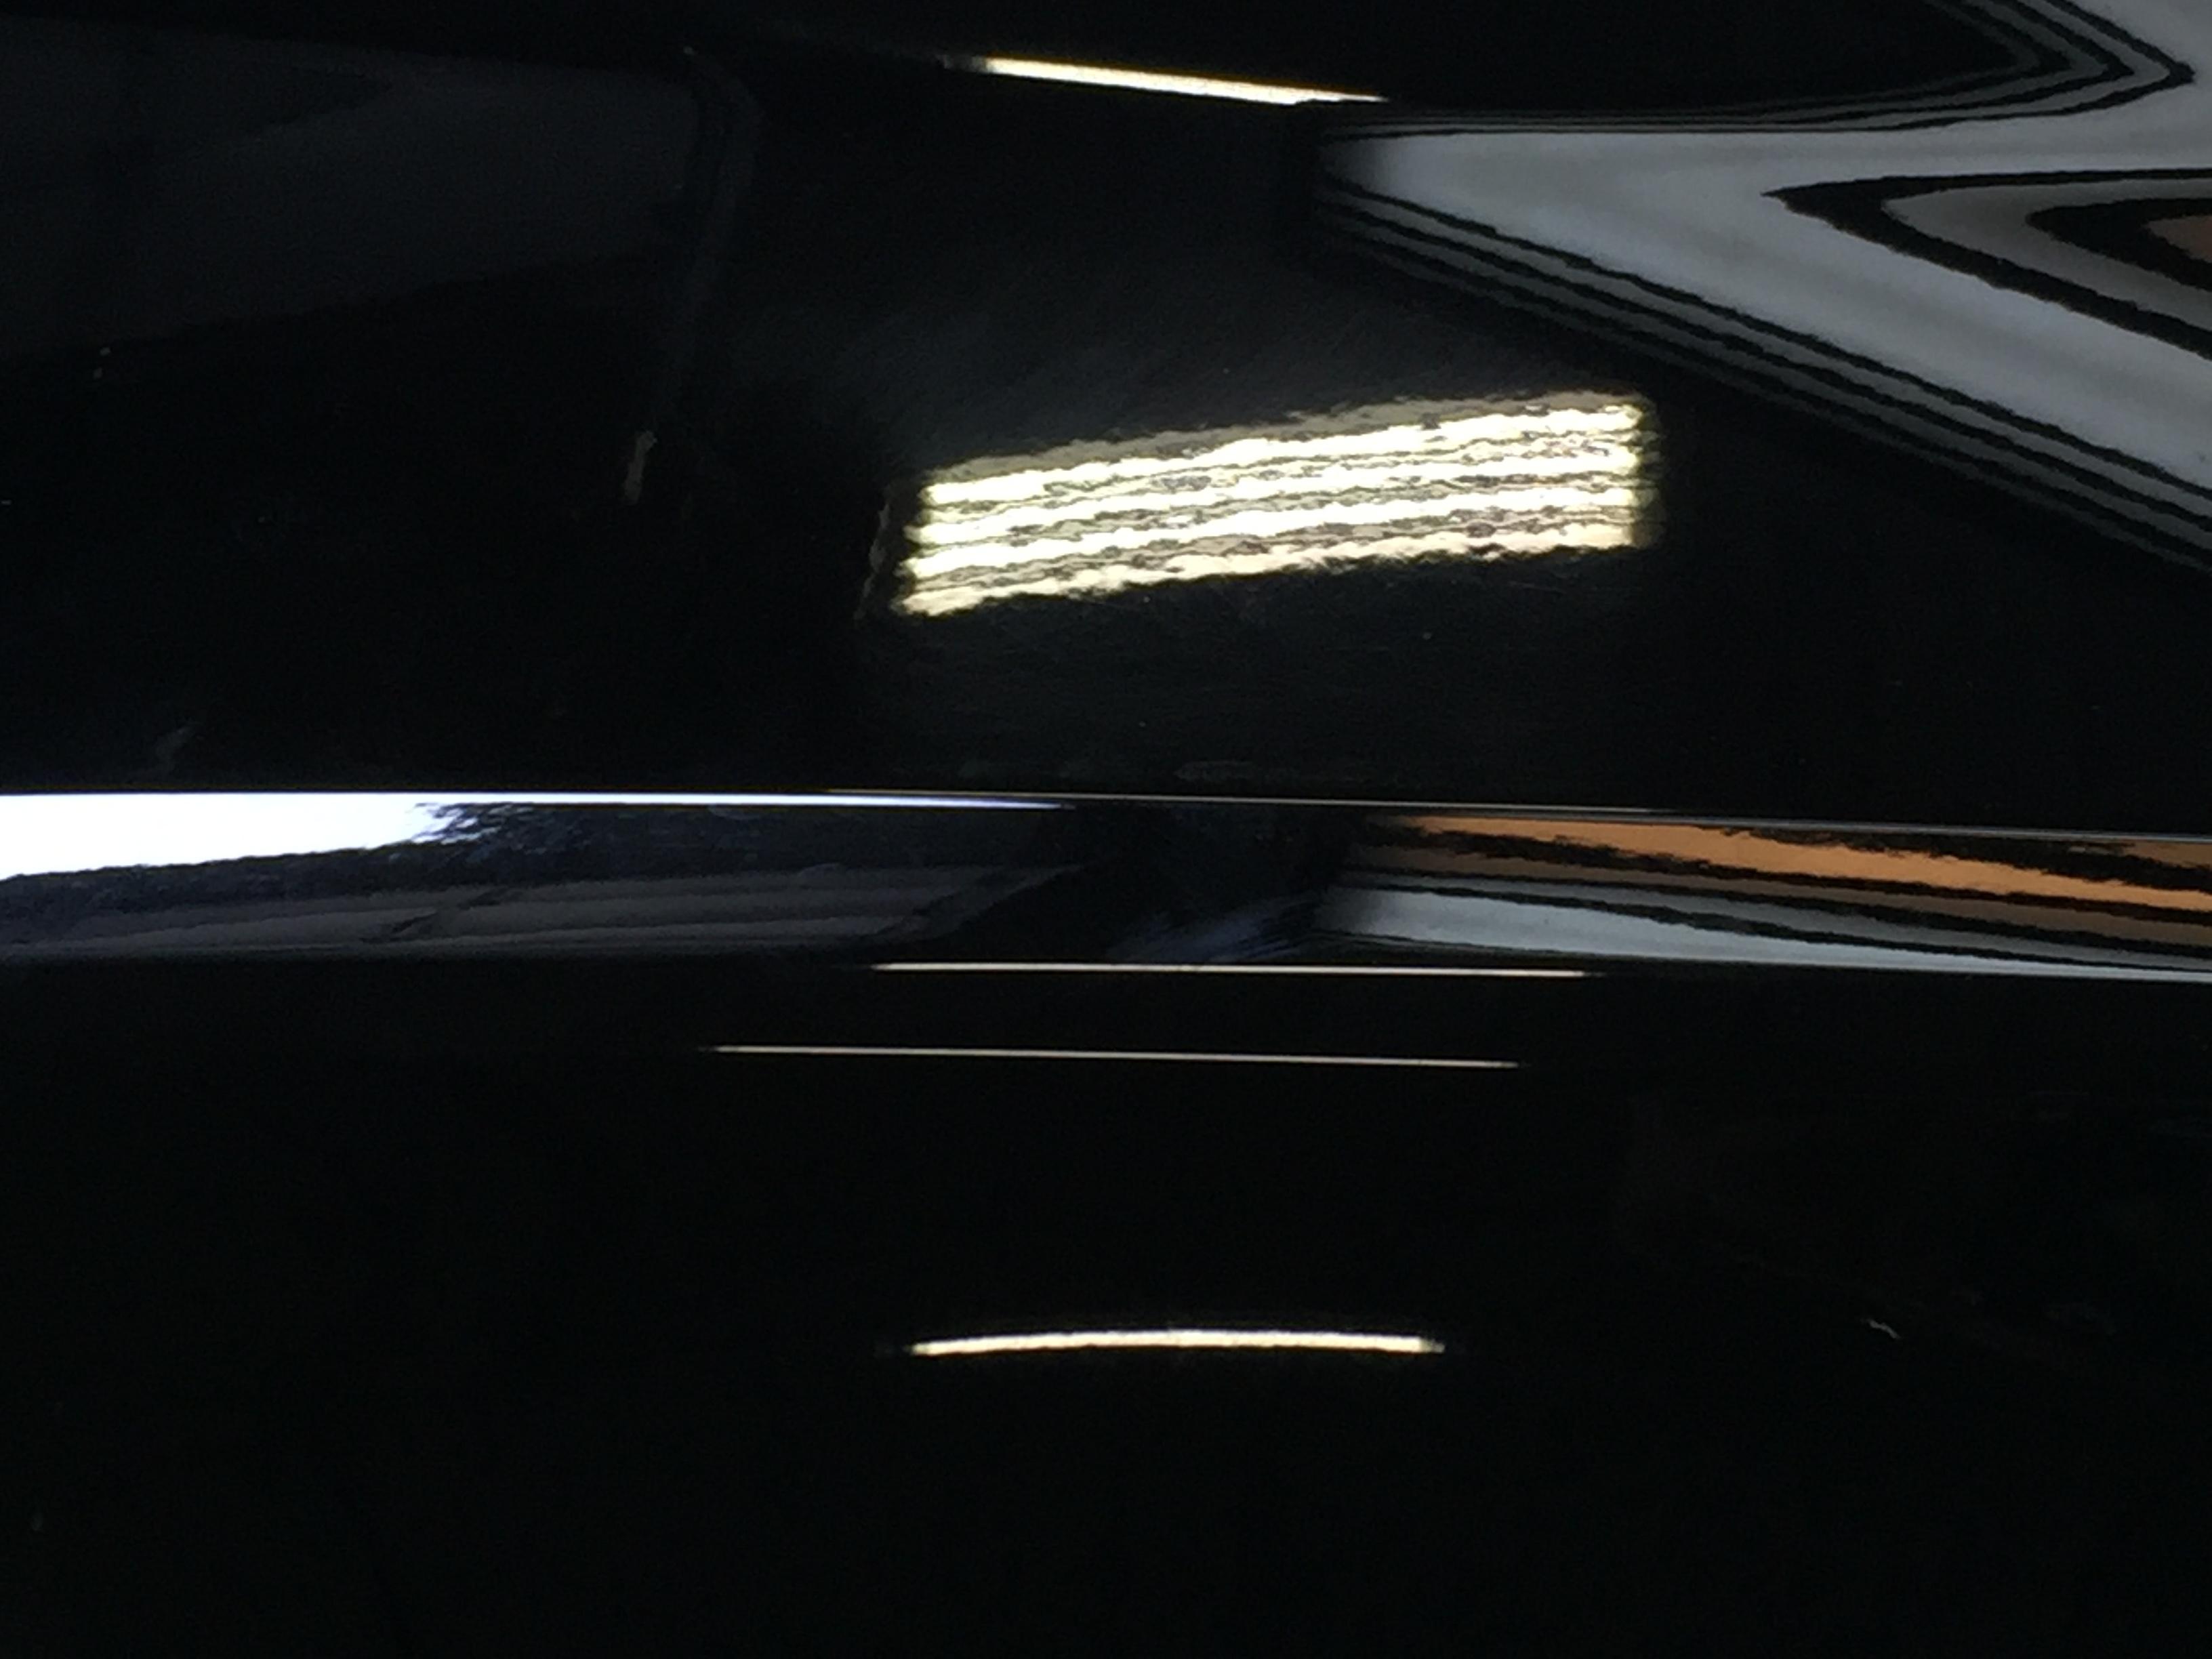 2016 Chrysler 300 C AWD Dent Repair on Aluminum Hood, hail damage, Springfield, IL. PDR http://217dent.com